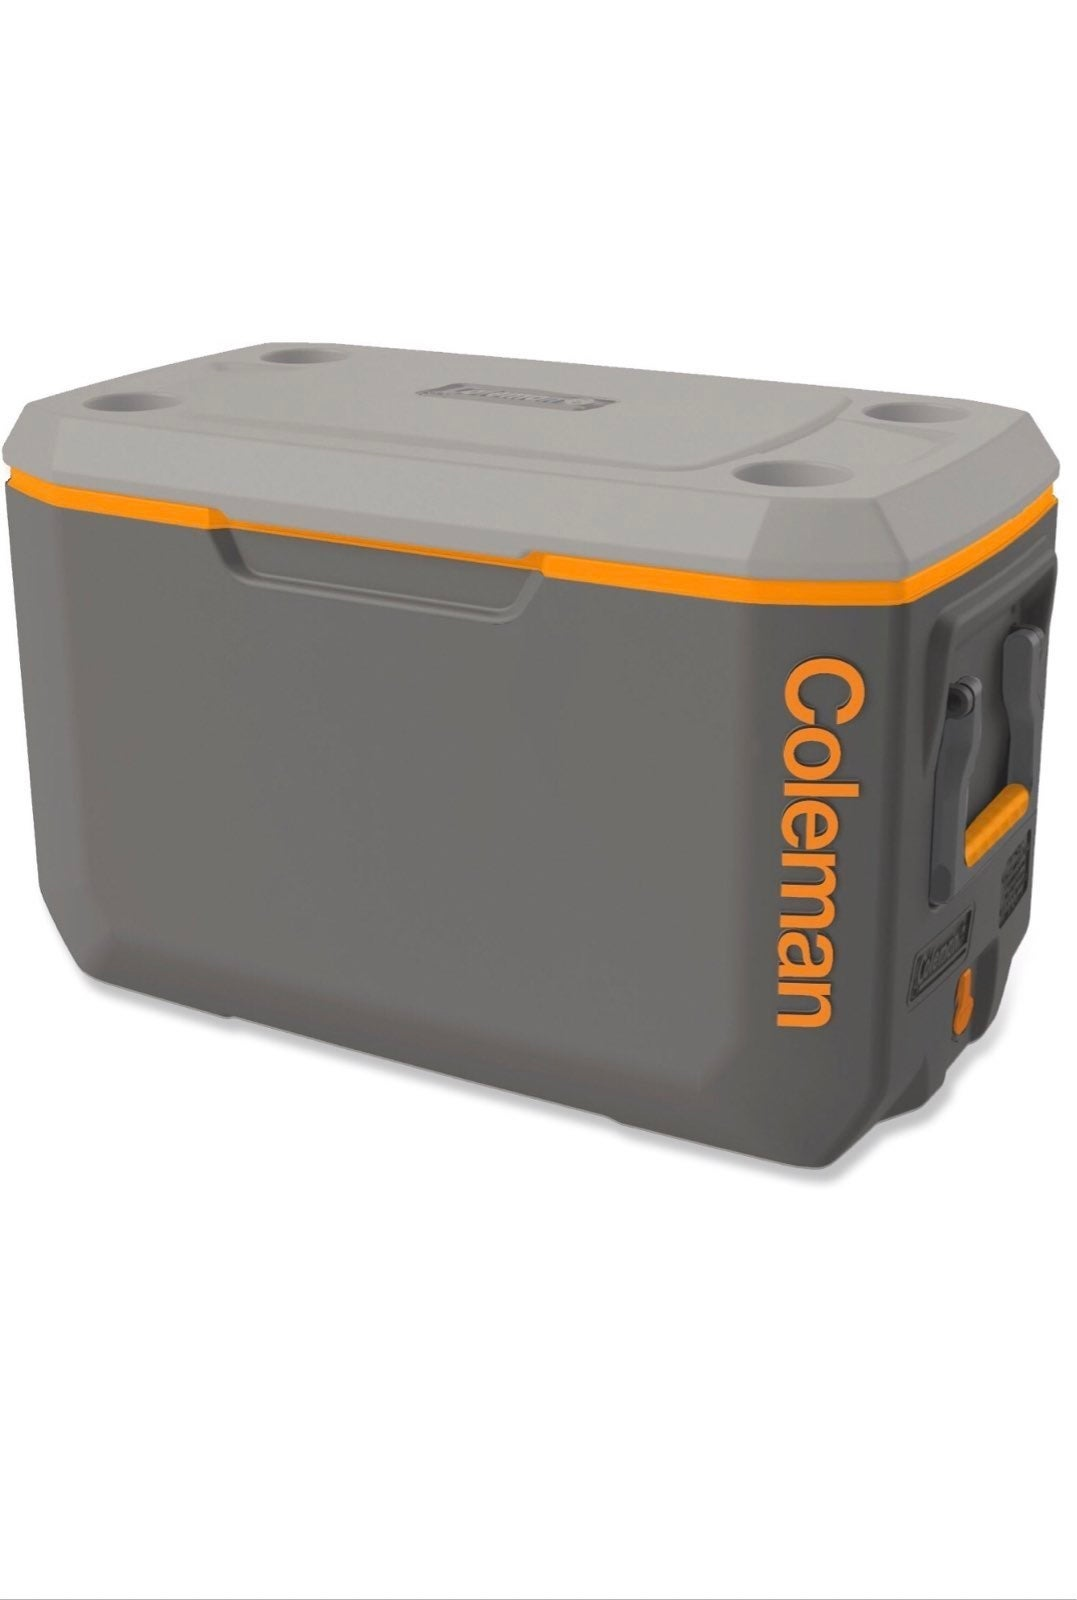 Coleman Extreme 5 Cooler (70 qts)